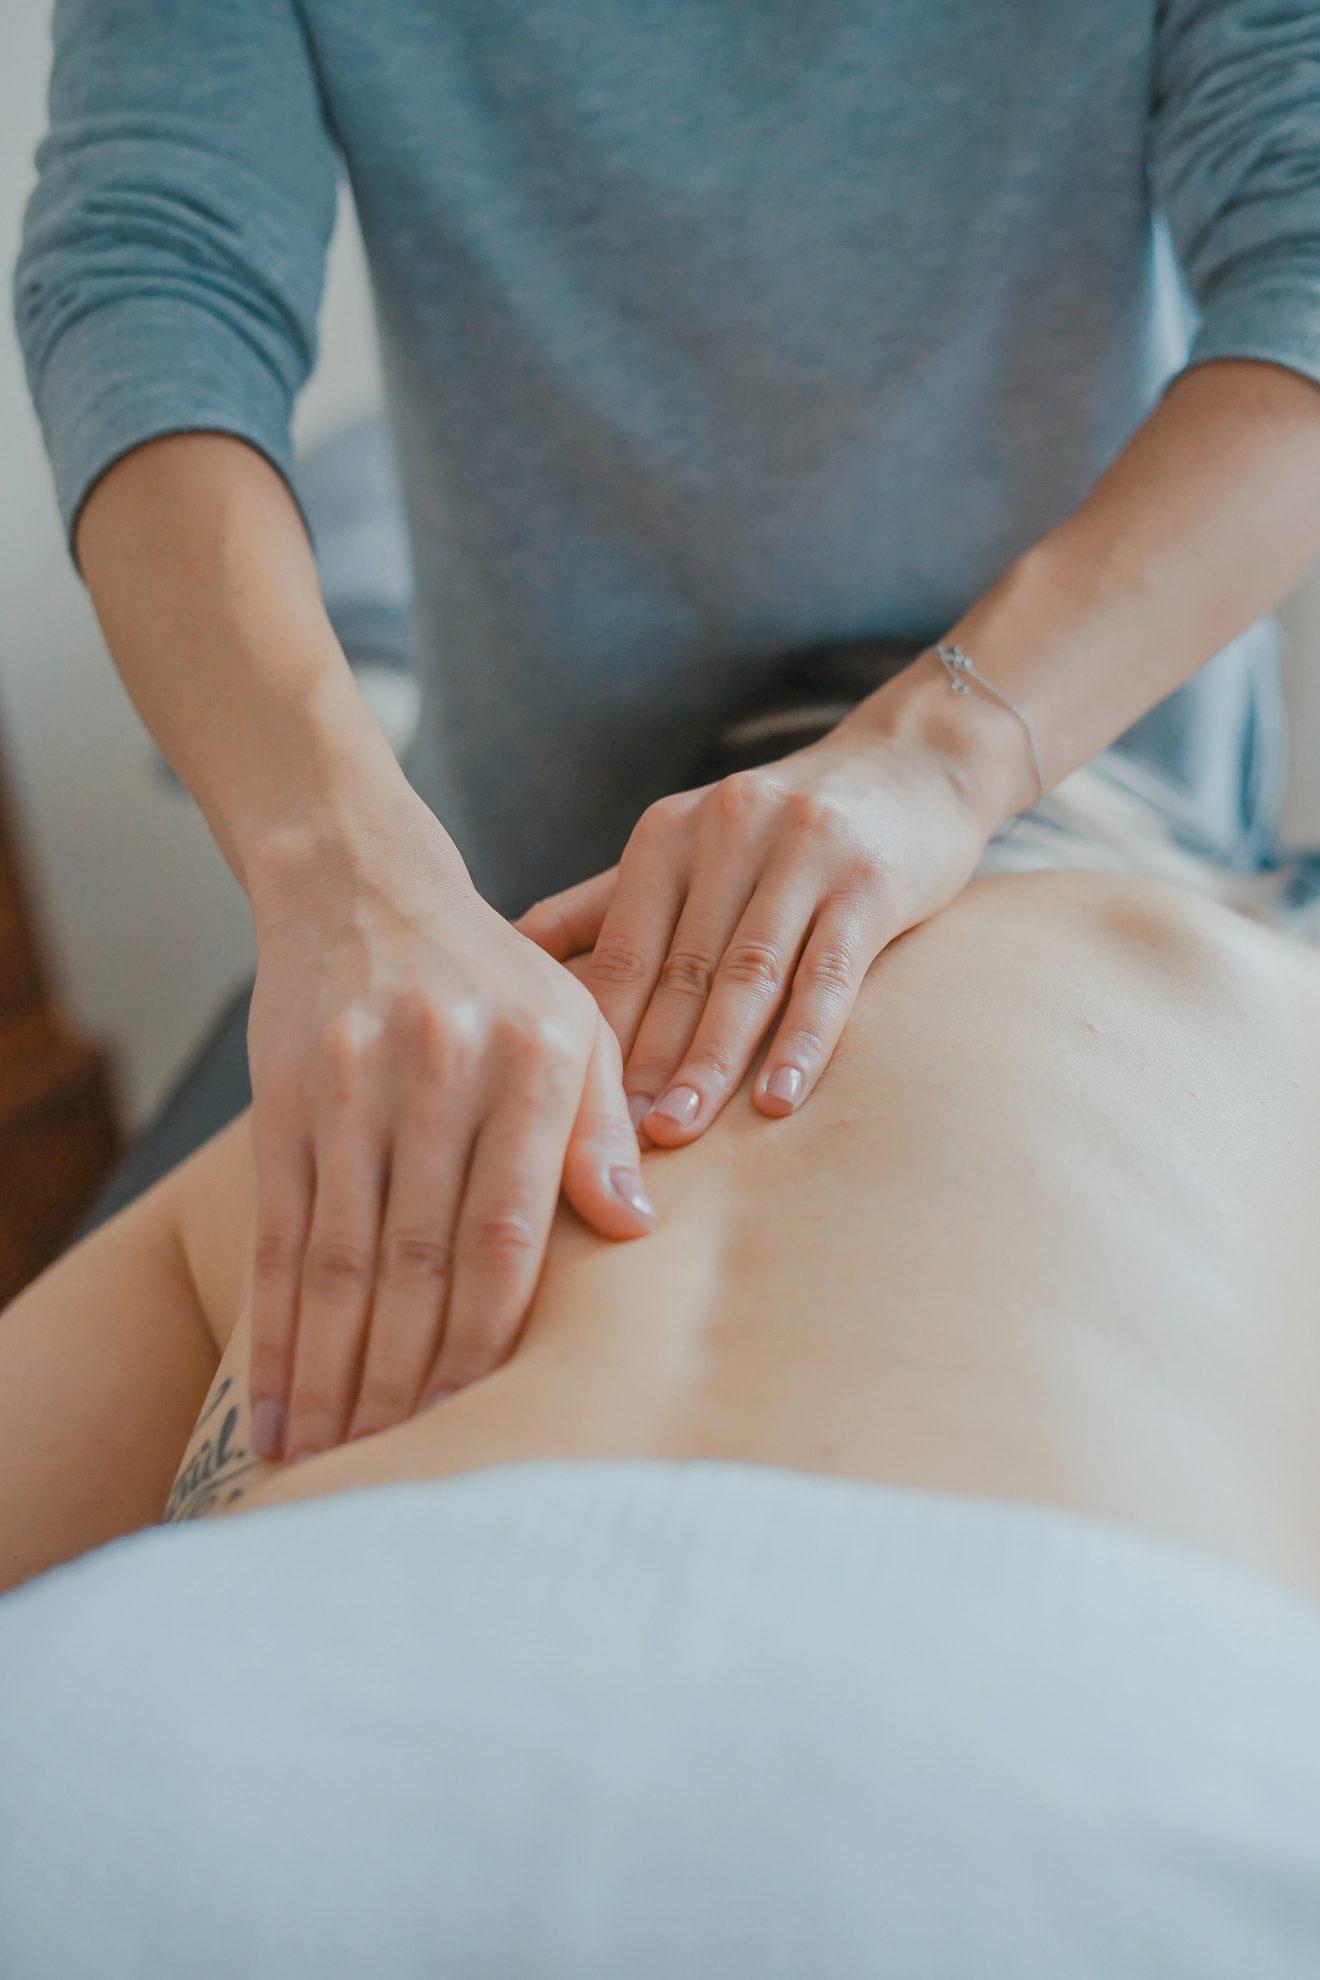 Illuminari Med Spa Massage Therapy